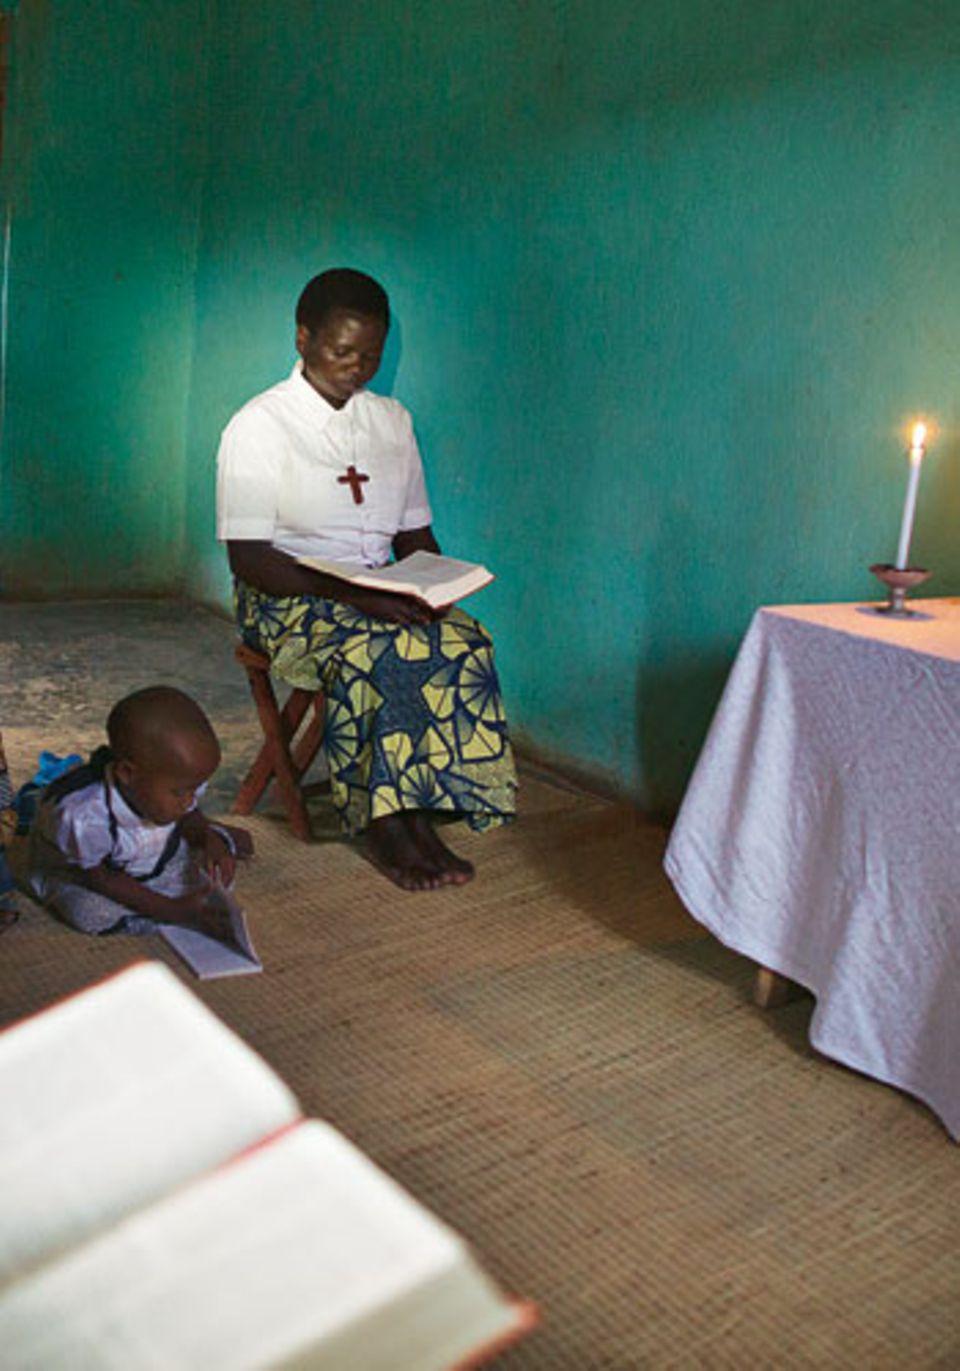 Donatila: Morgengebet um 4.30 Uhr